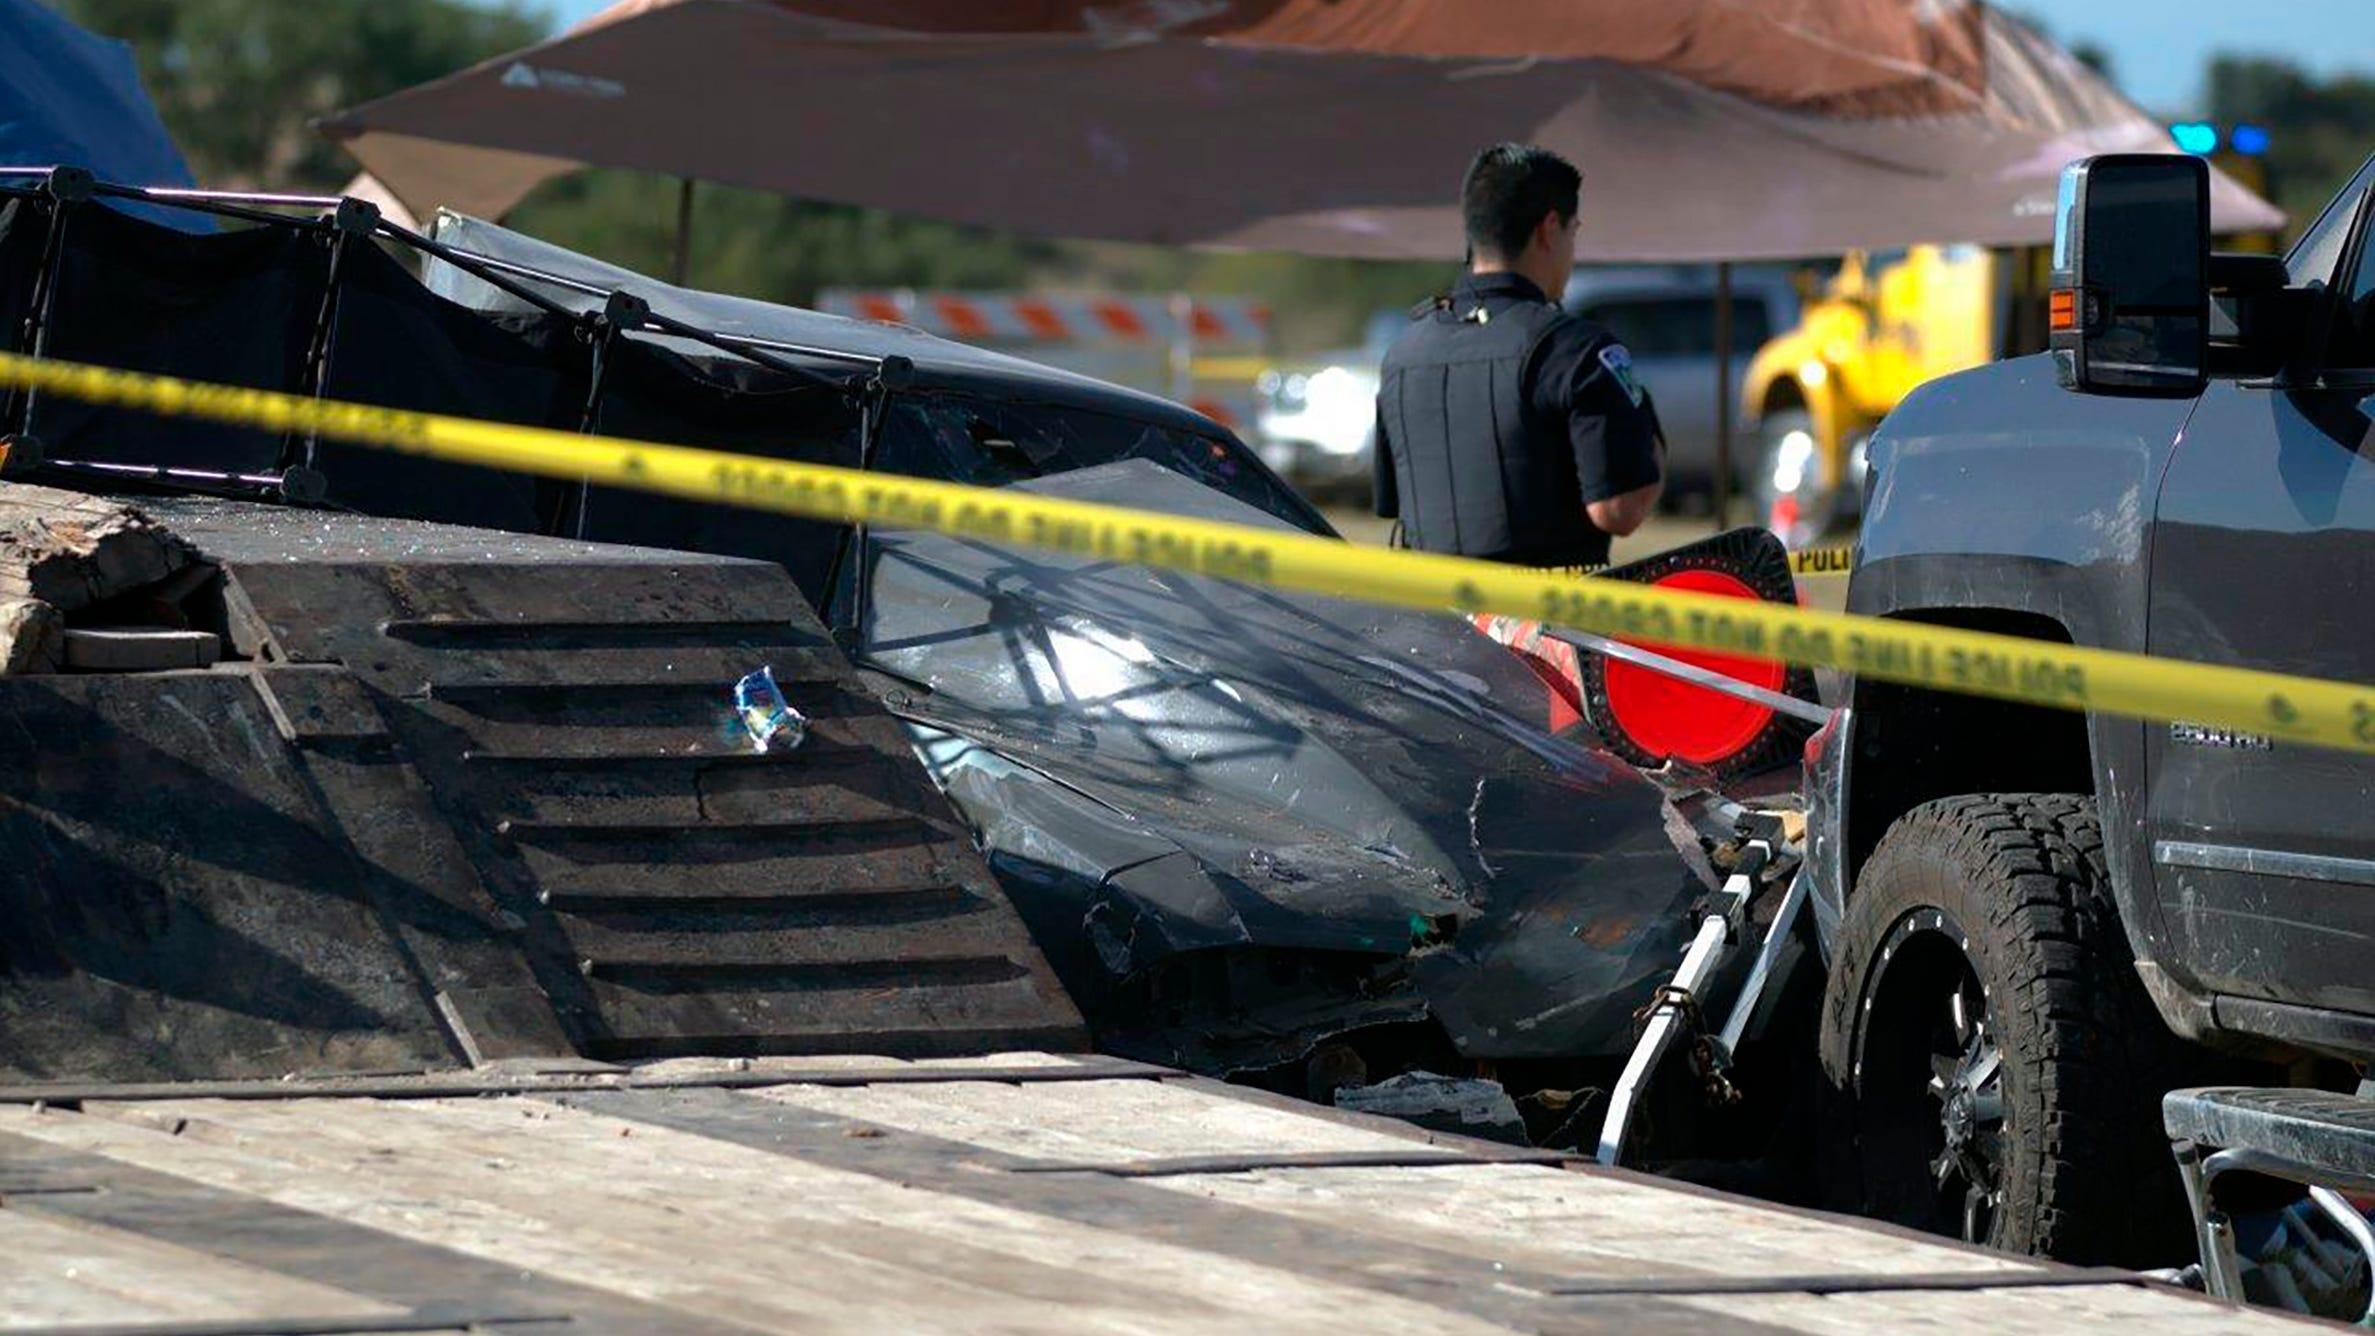 Texas drag race driver slams into spectators, killing 2 boys